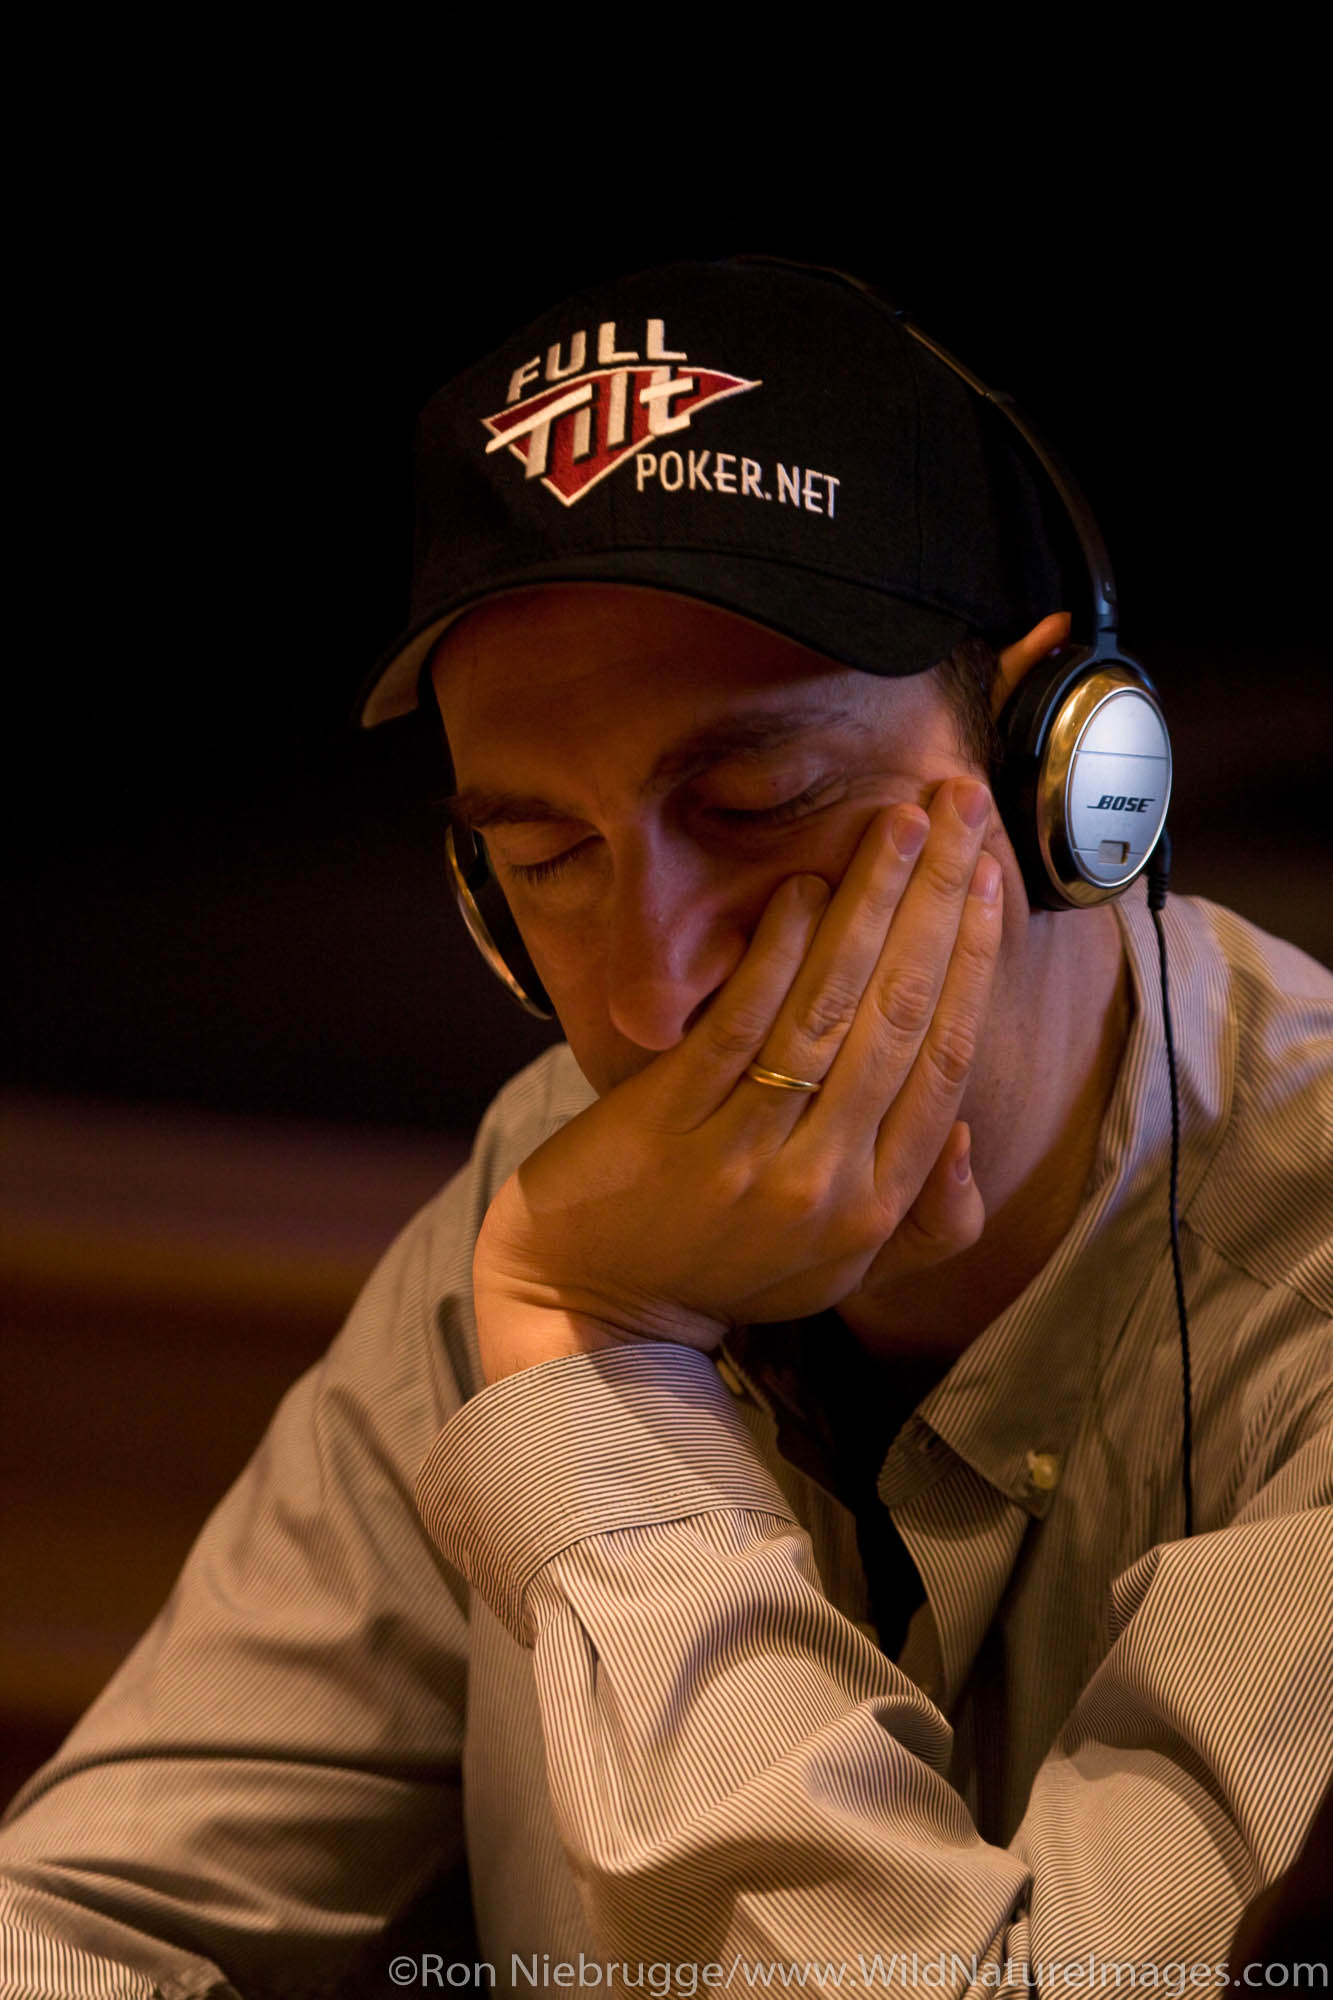 Eric Seidel, at the 2008 World Poker Tour Festa Al Lago poker tournament at the Bellagio Resort and Casino, Las Vegas, Nevada...